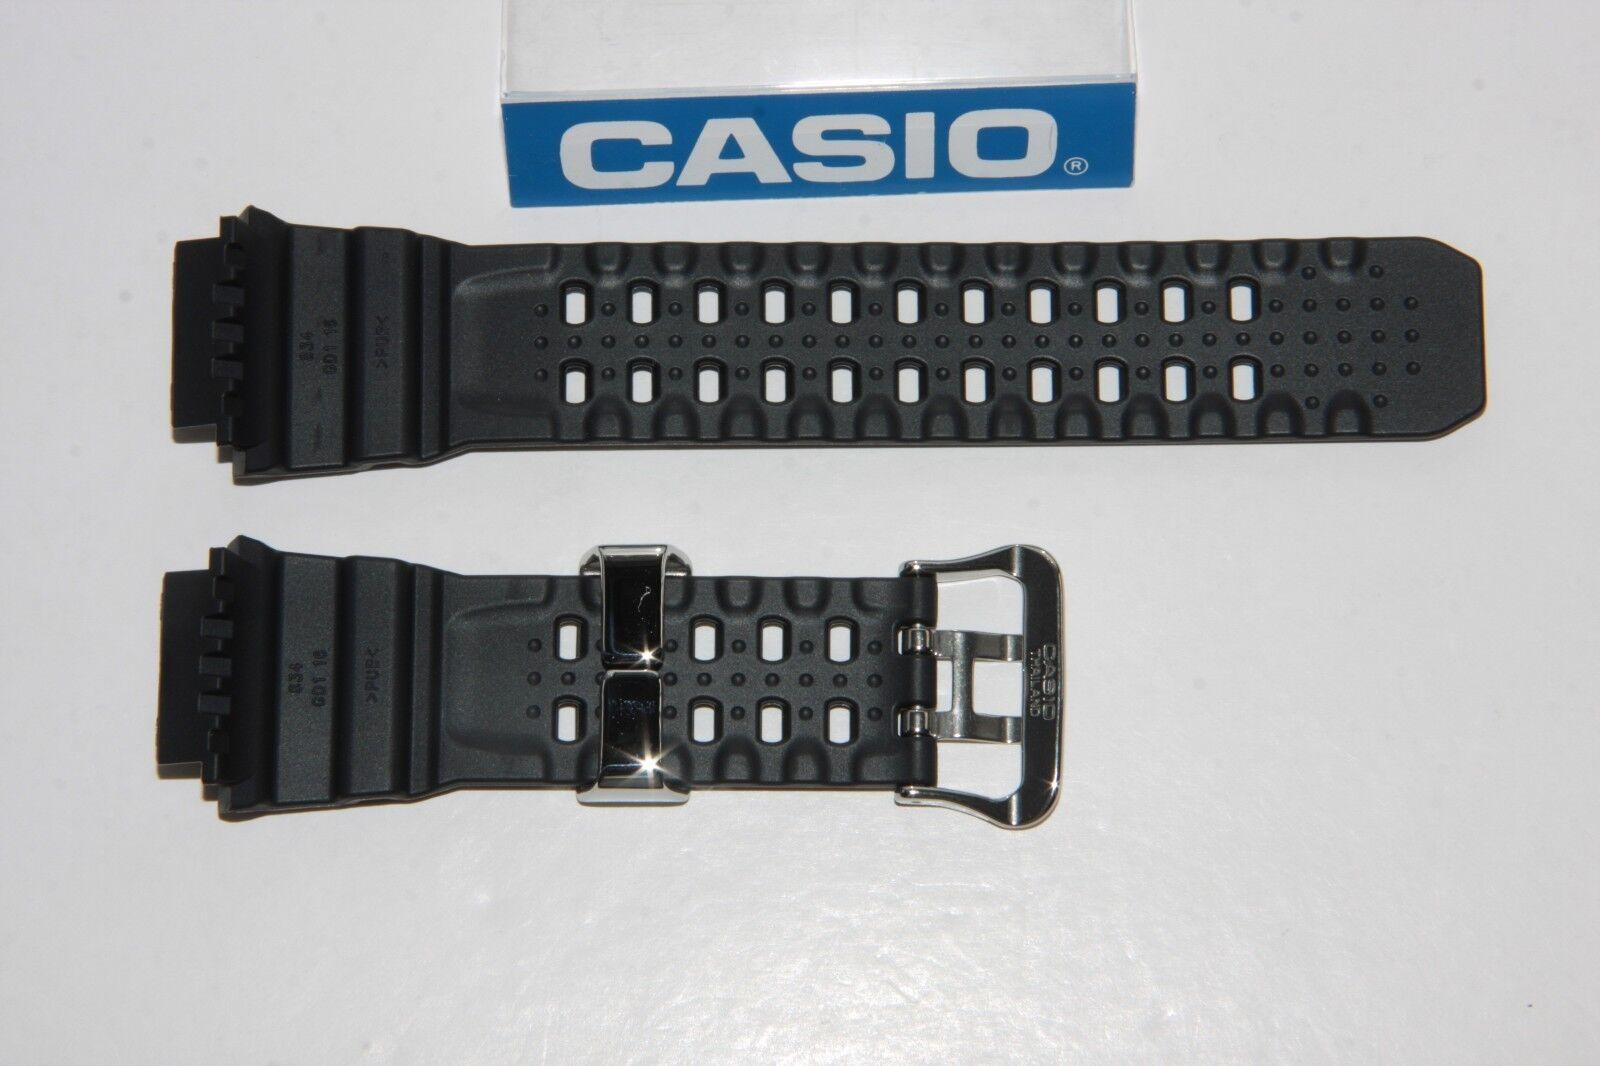 CASIO G Shock GW 9400 1 ORIGINAL NEUF en caoutchouc noir  x9xNK